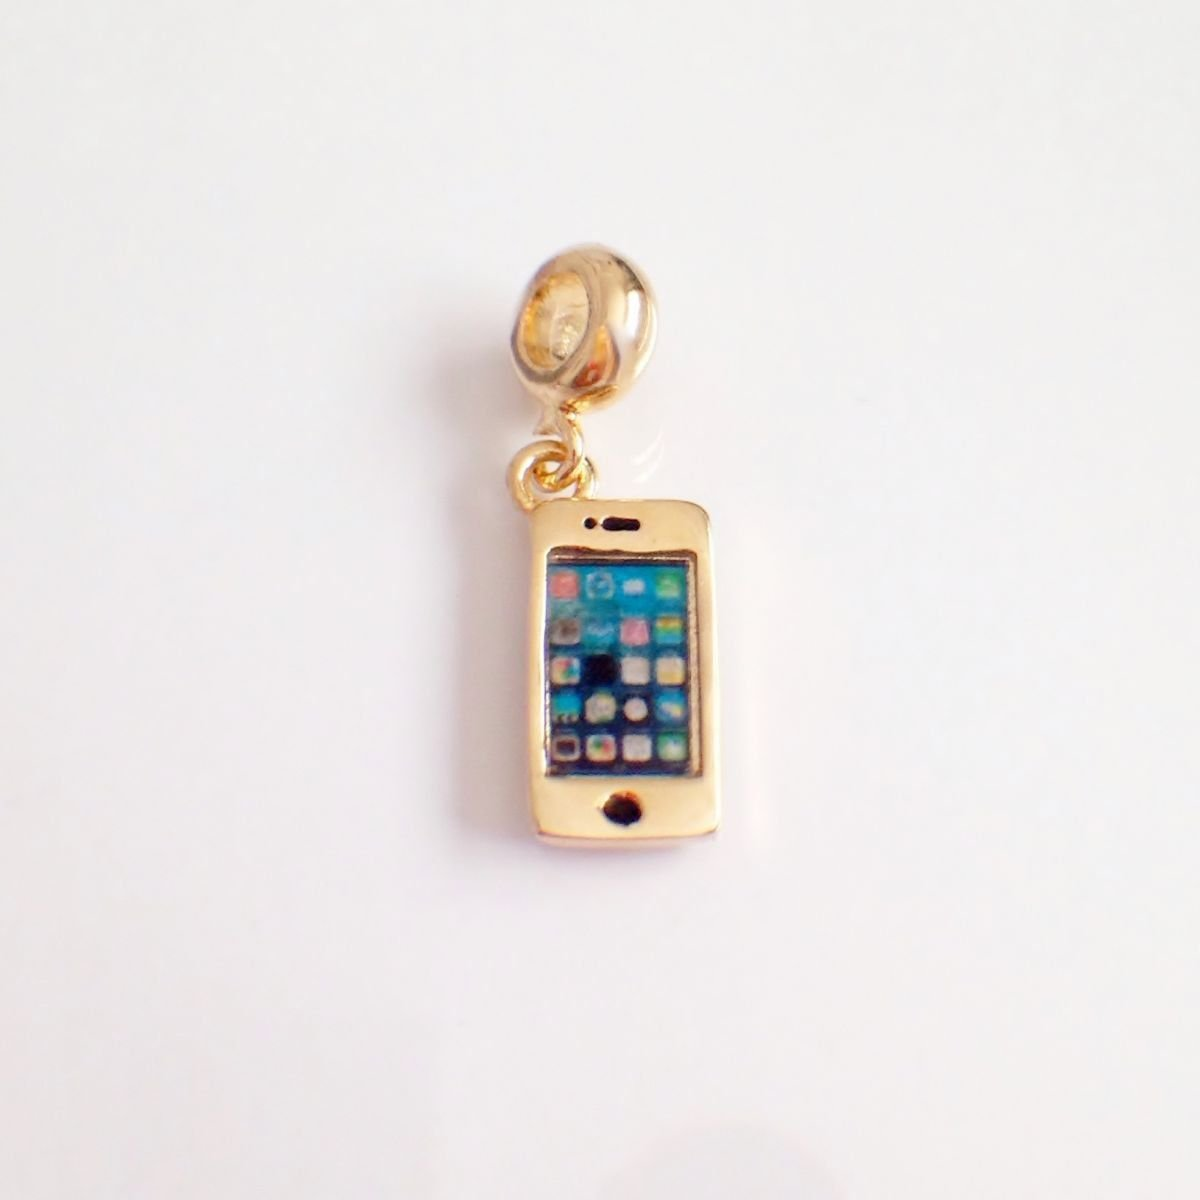 Berloque Iphone Dourado